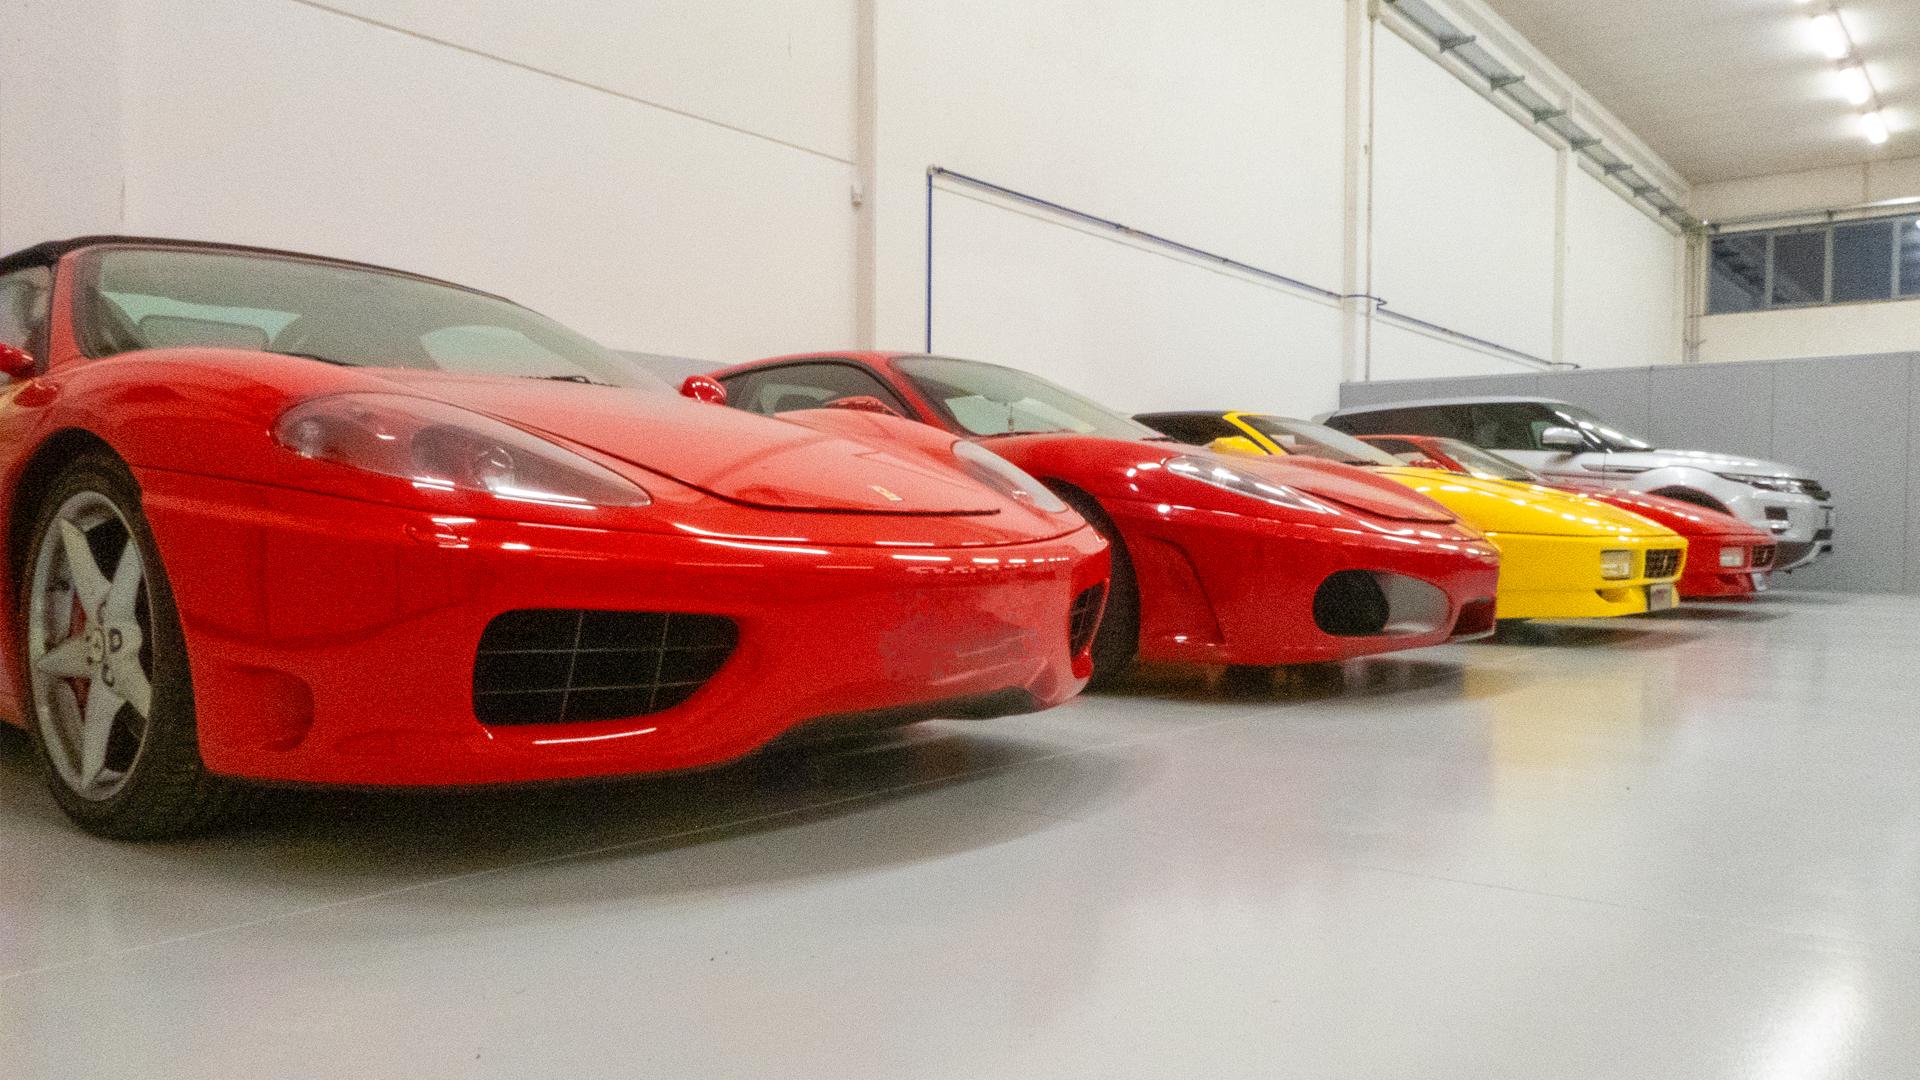 Ferrari Vendita e Consuenza